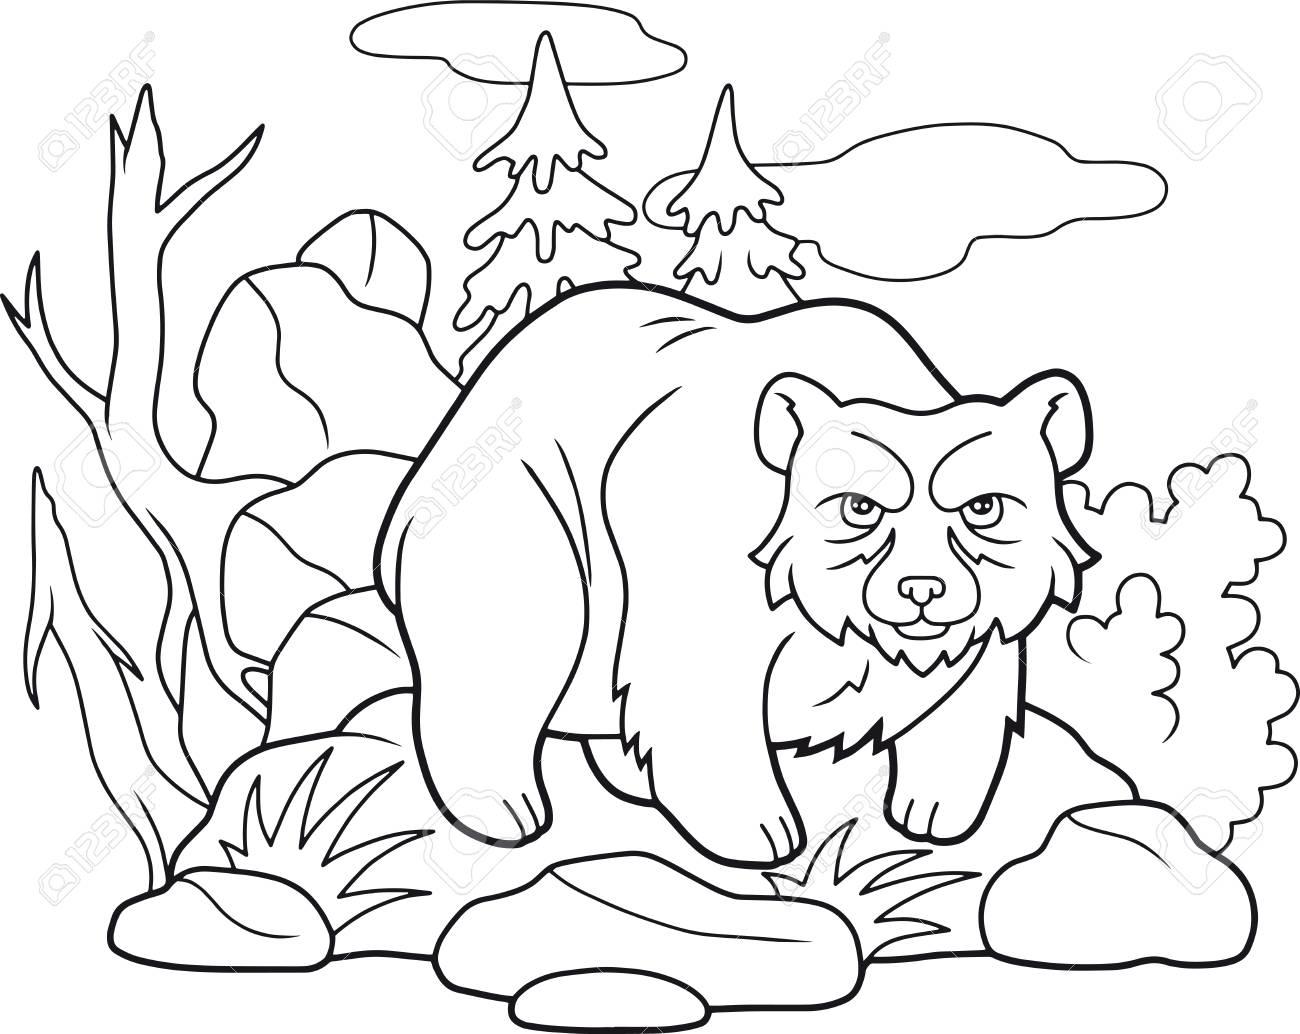 Cartoon Funny Bear Coloring Book Royalty Free Cliparts, Vectors, And ...